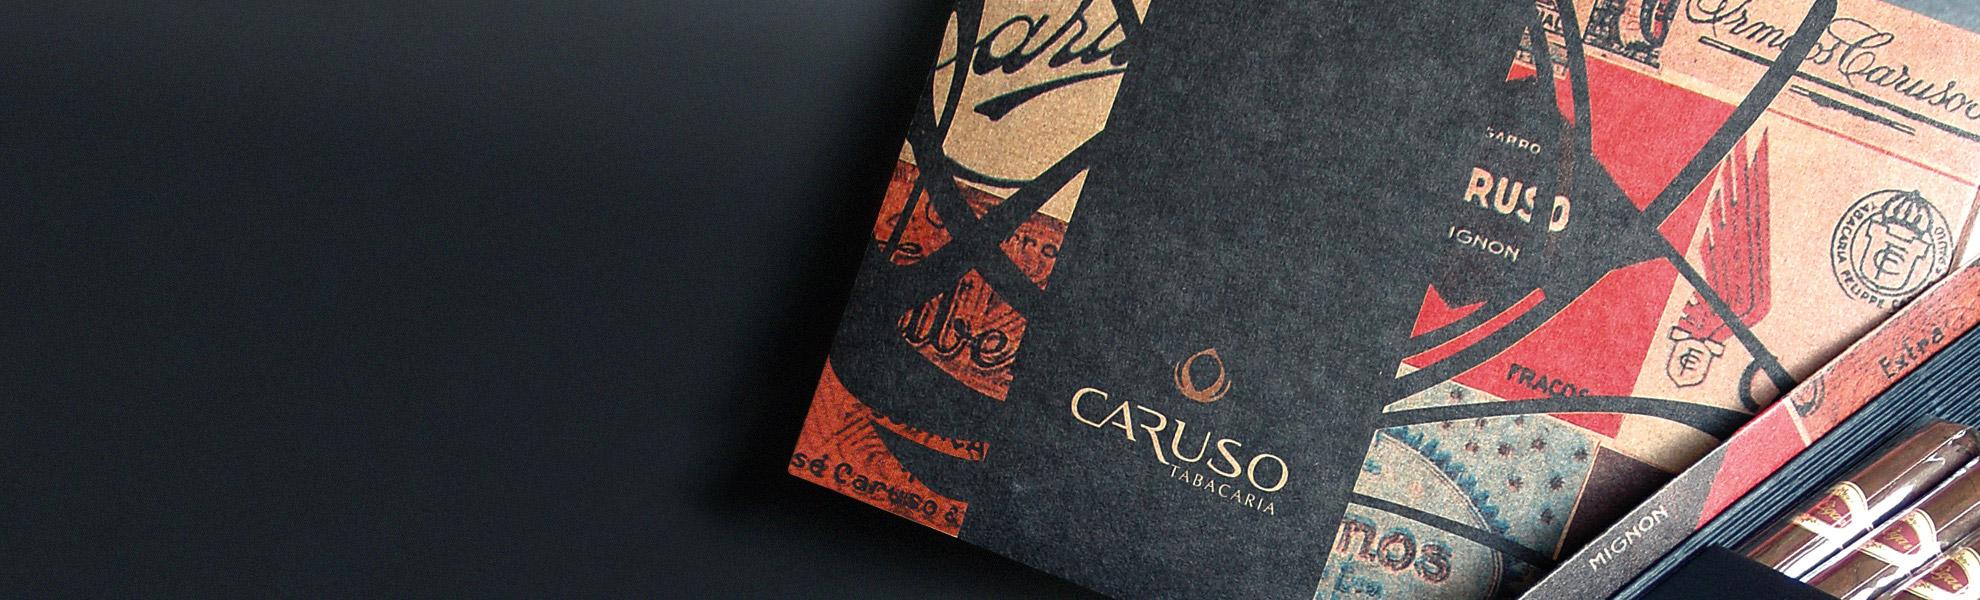 chelles-e-hayashi-design-portfolio-caruso-tabacaria-marca-experiencia-embalagem-identidade-visual